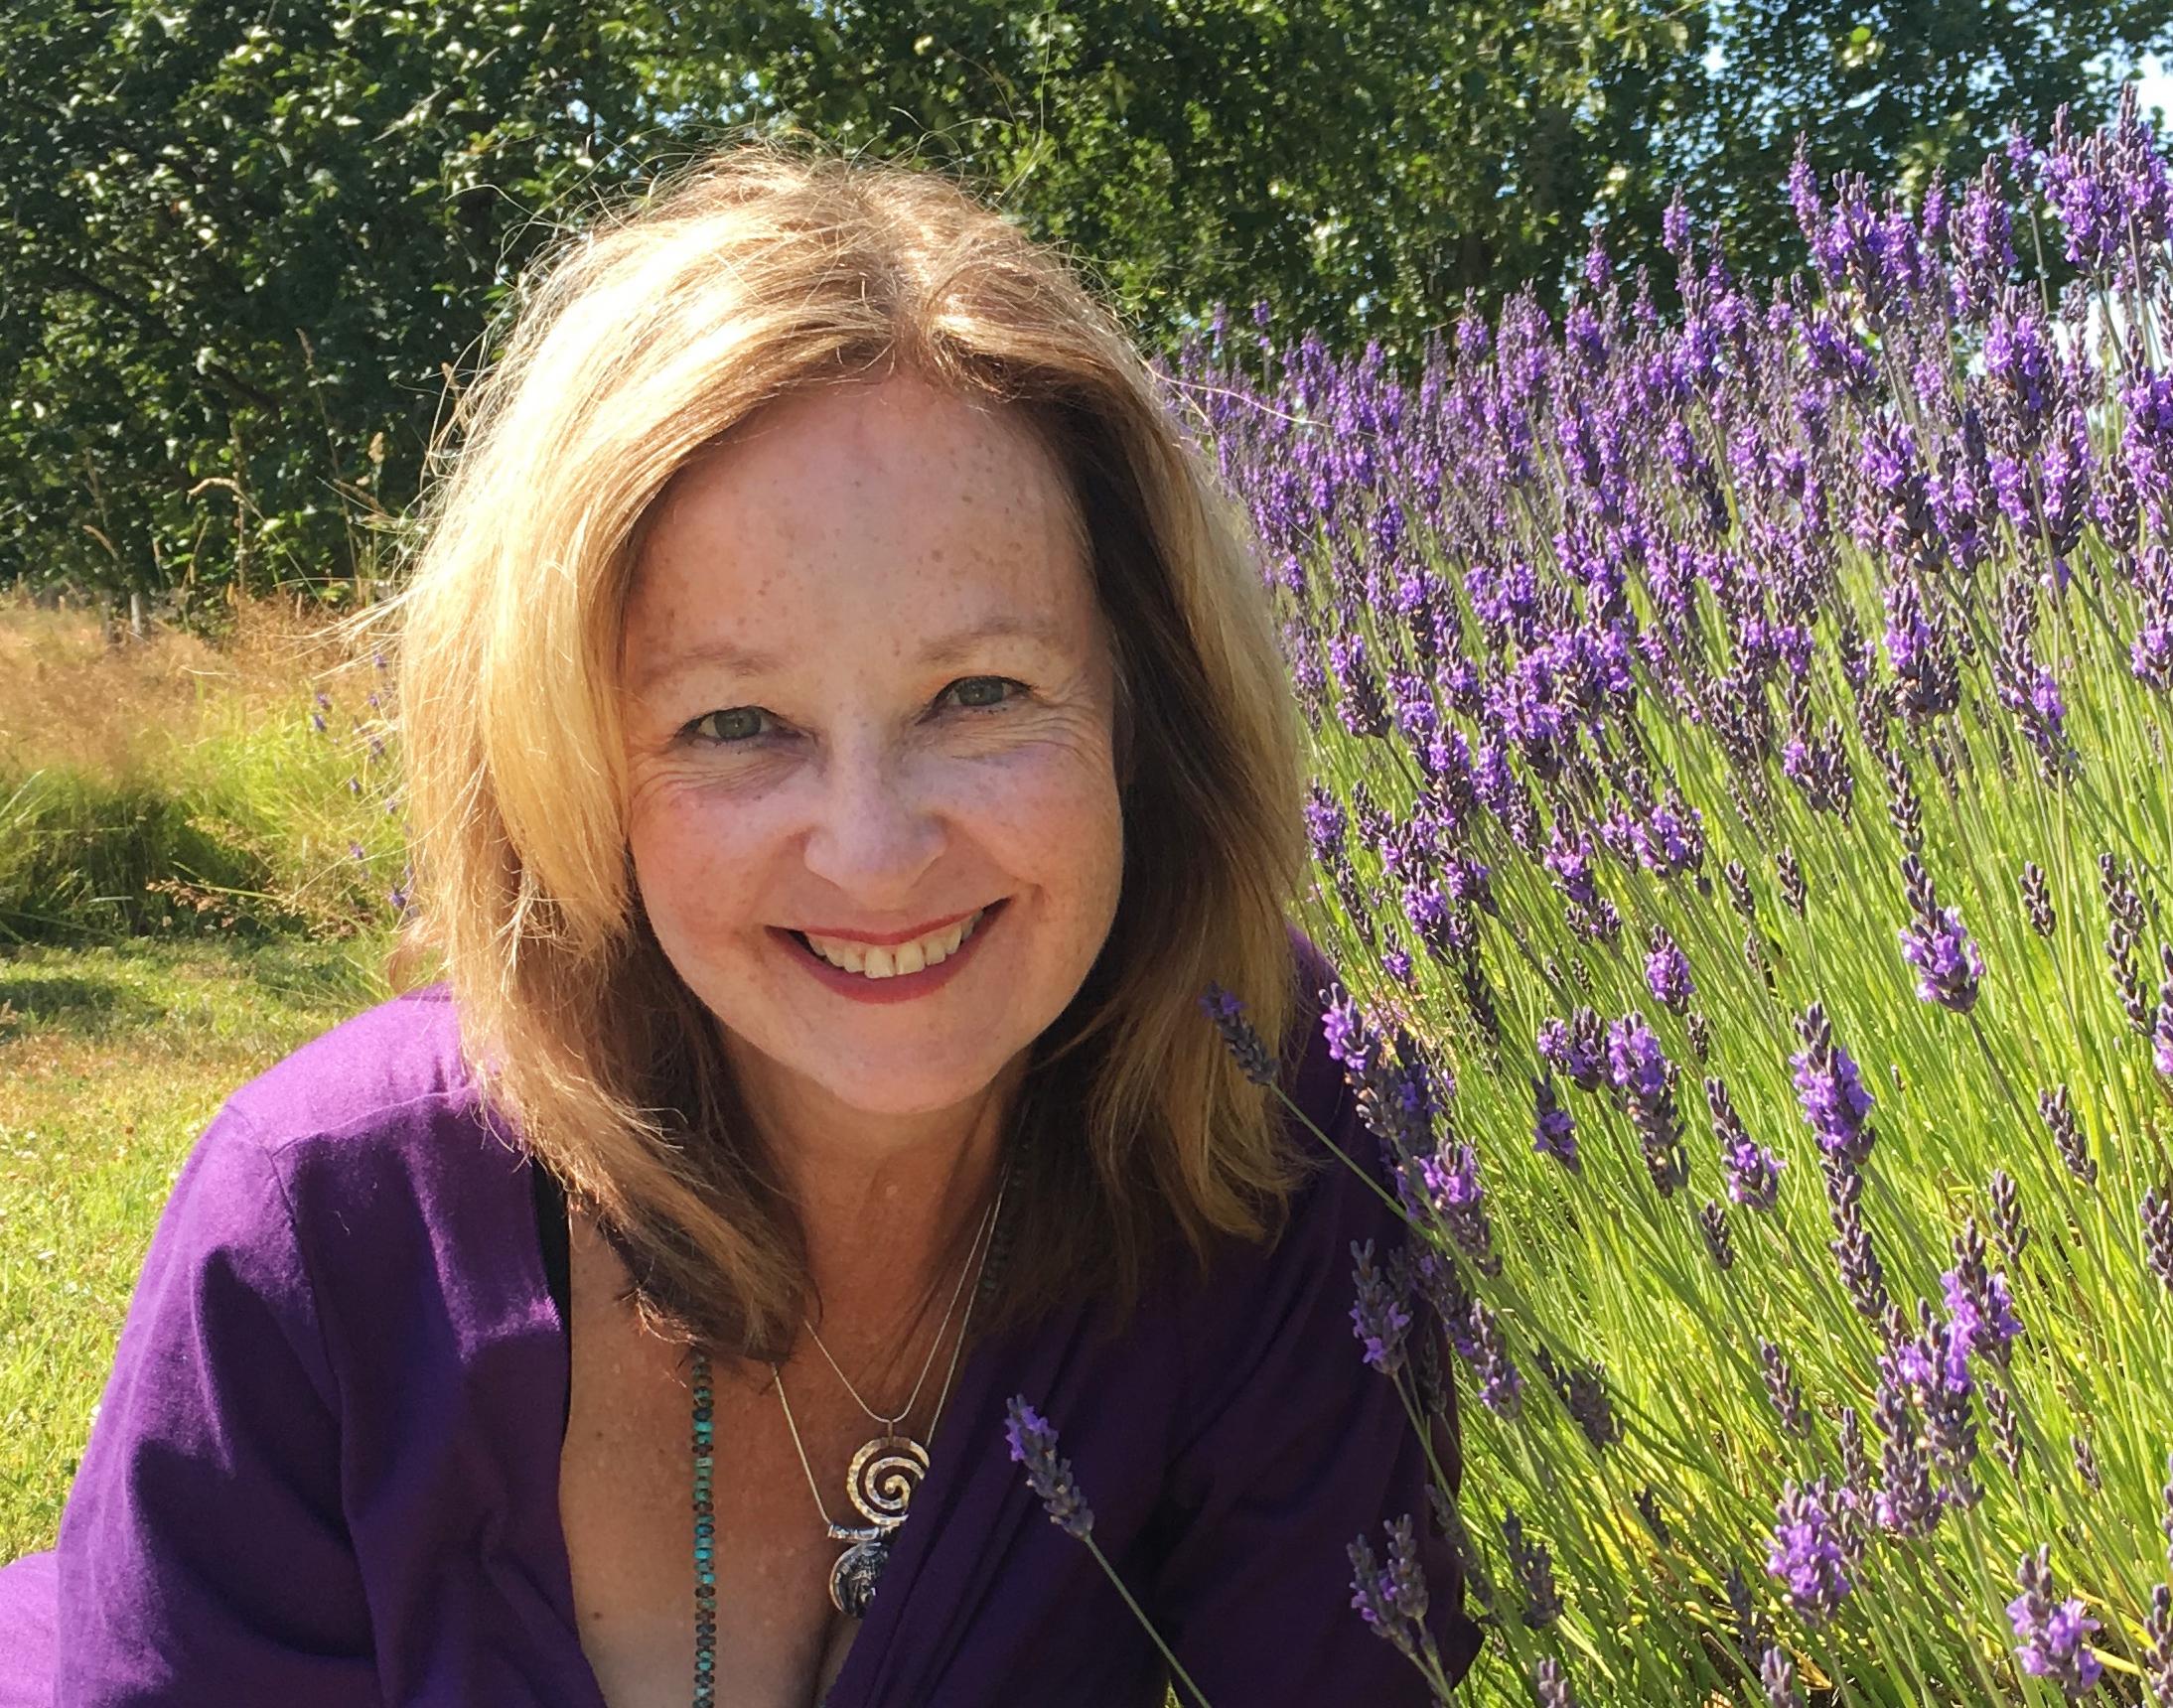 Joanna Powell Colbert・The Herbcrafter's Tarot